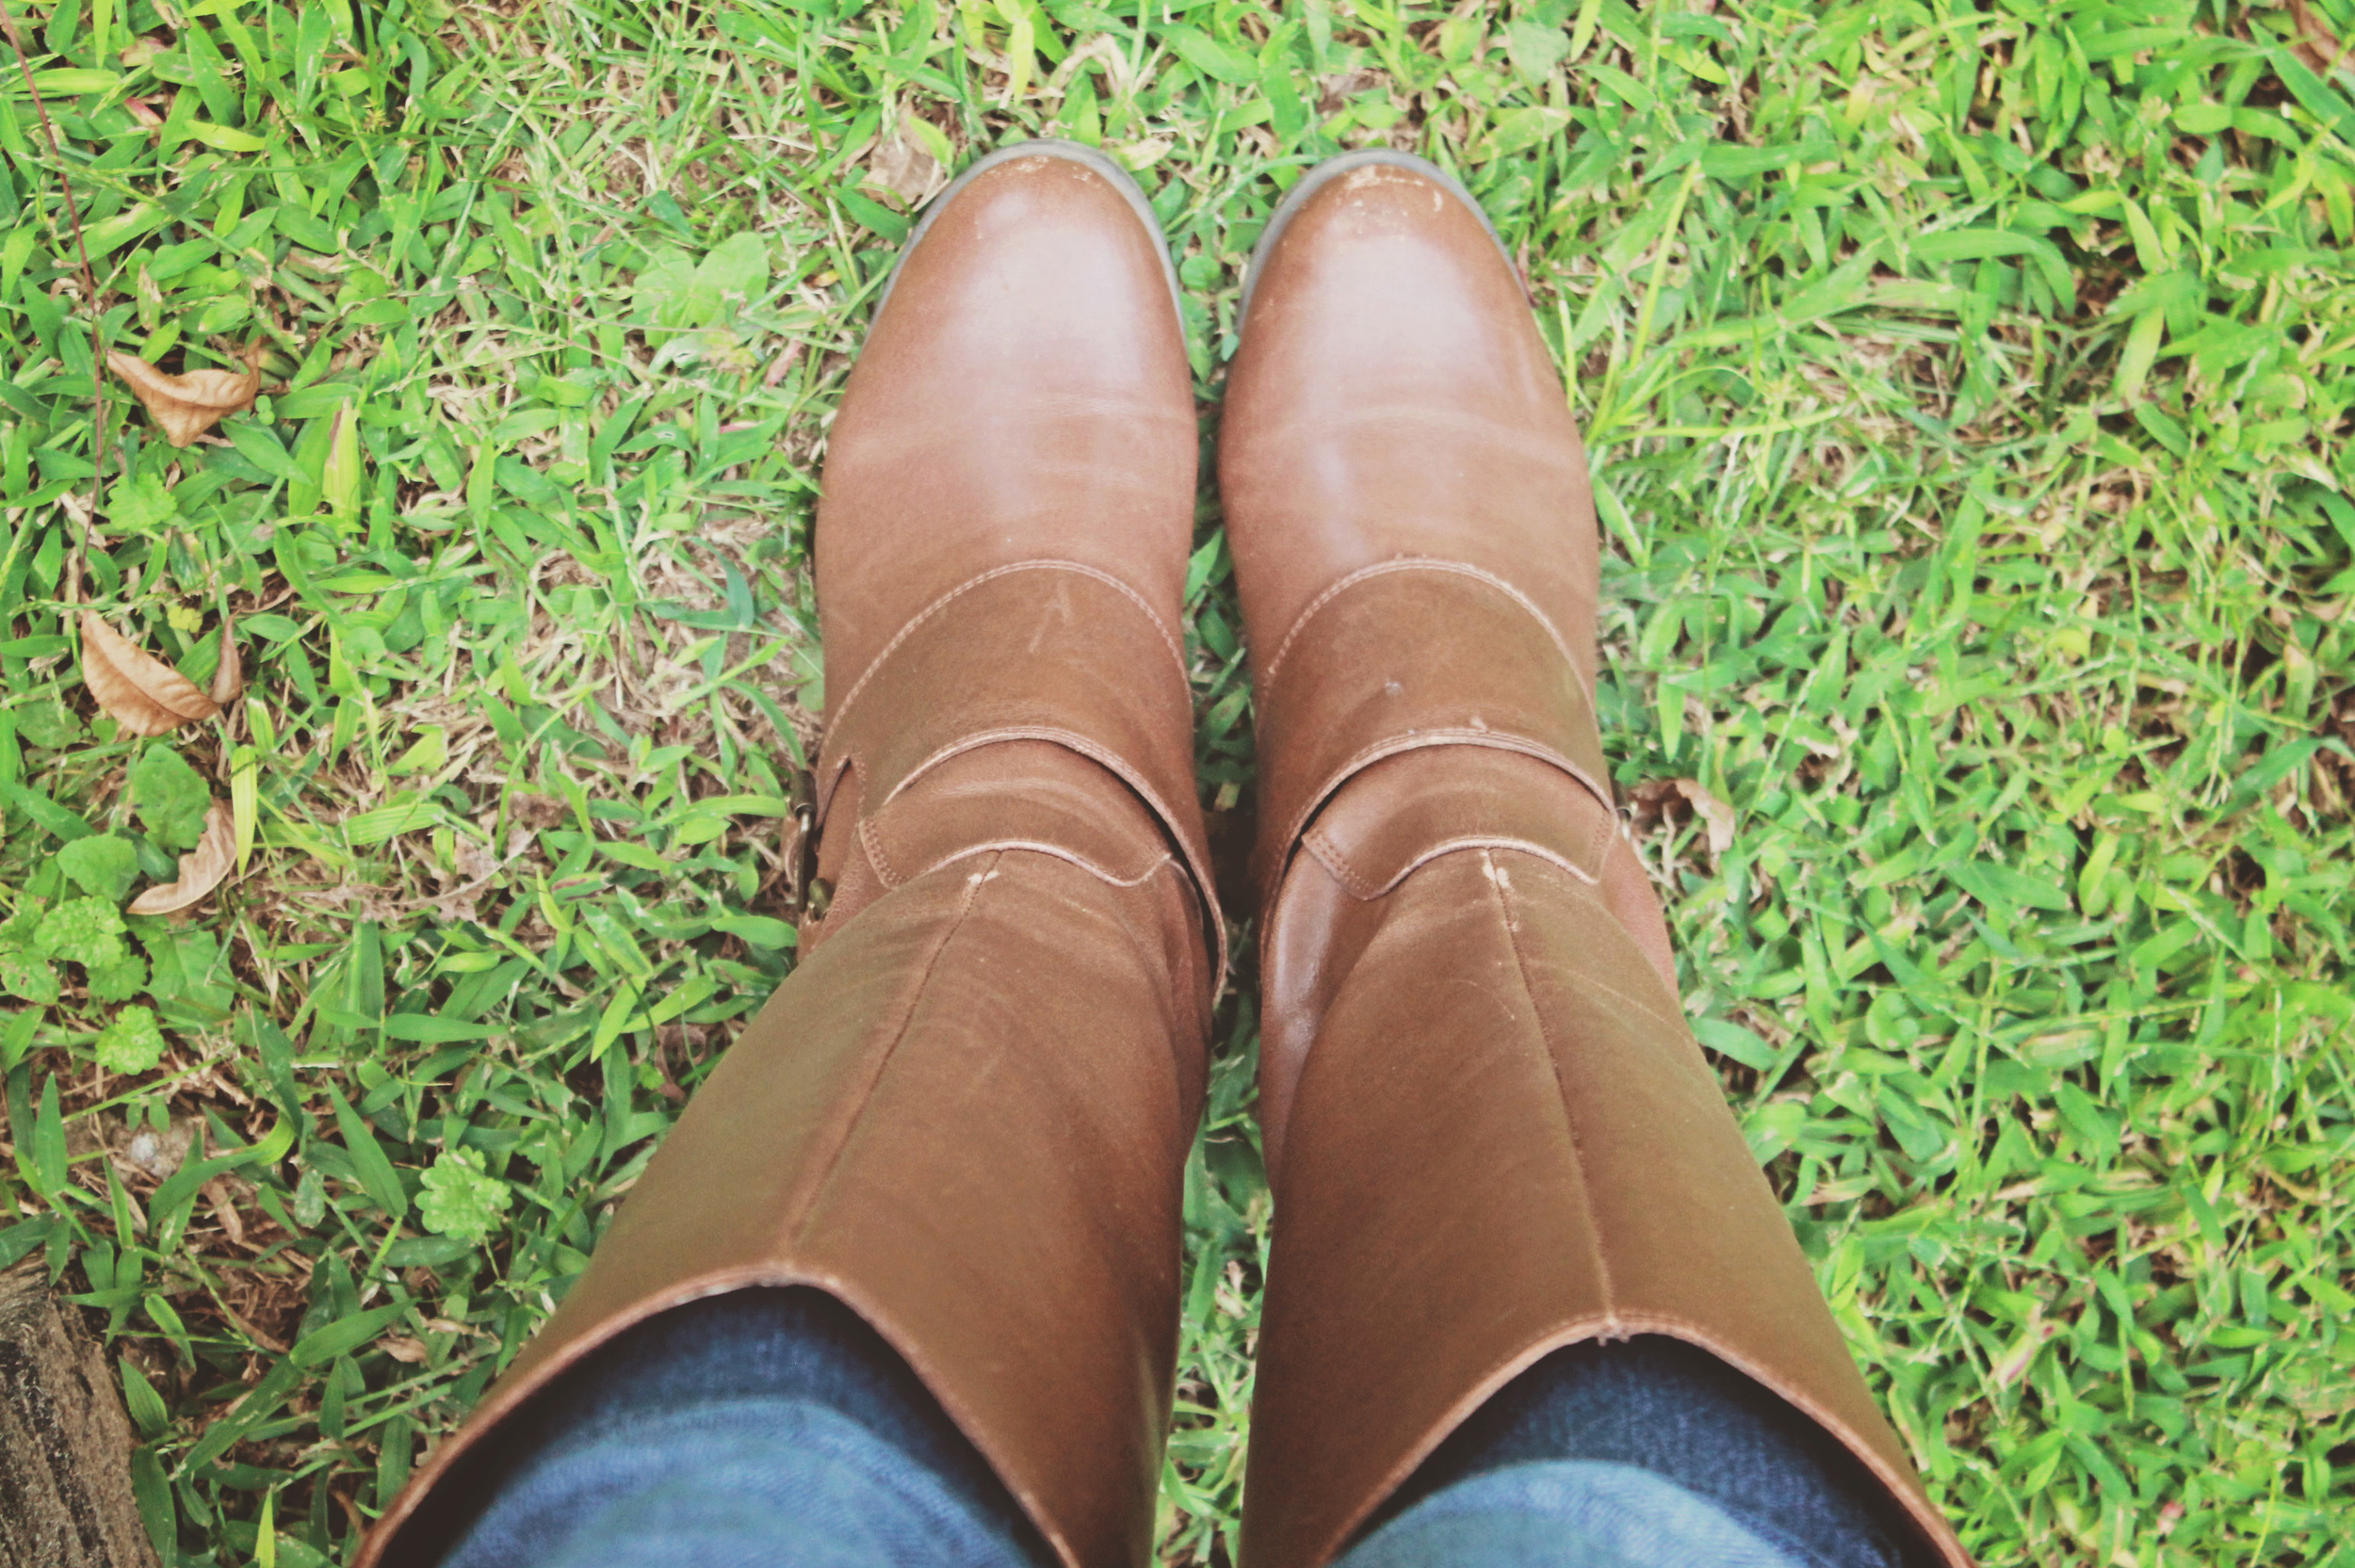 boots edited.jpg